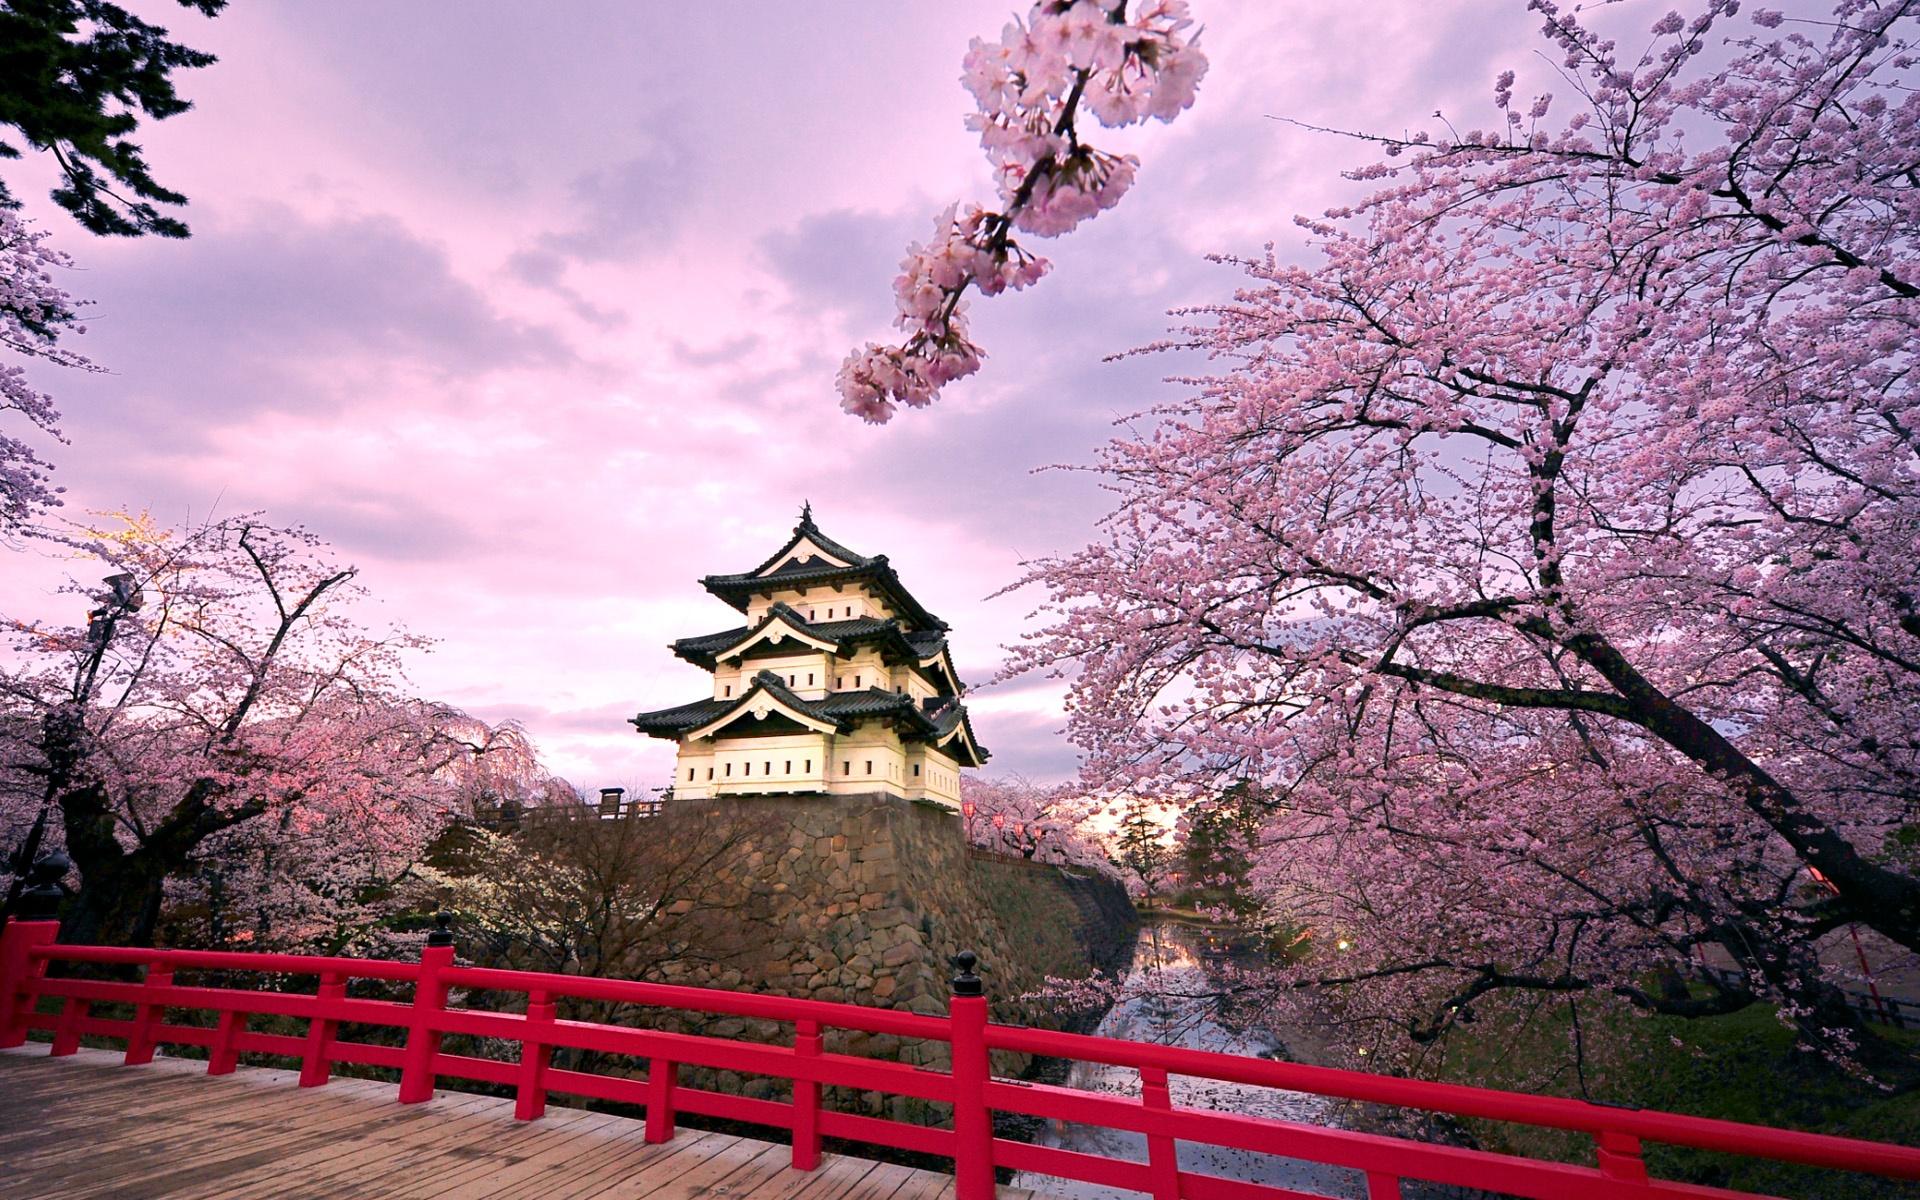 قلعه هیروساکی